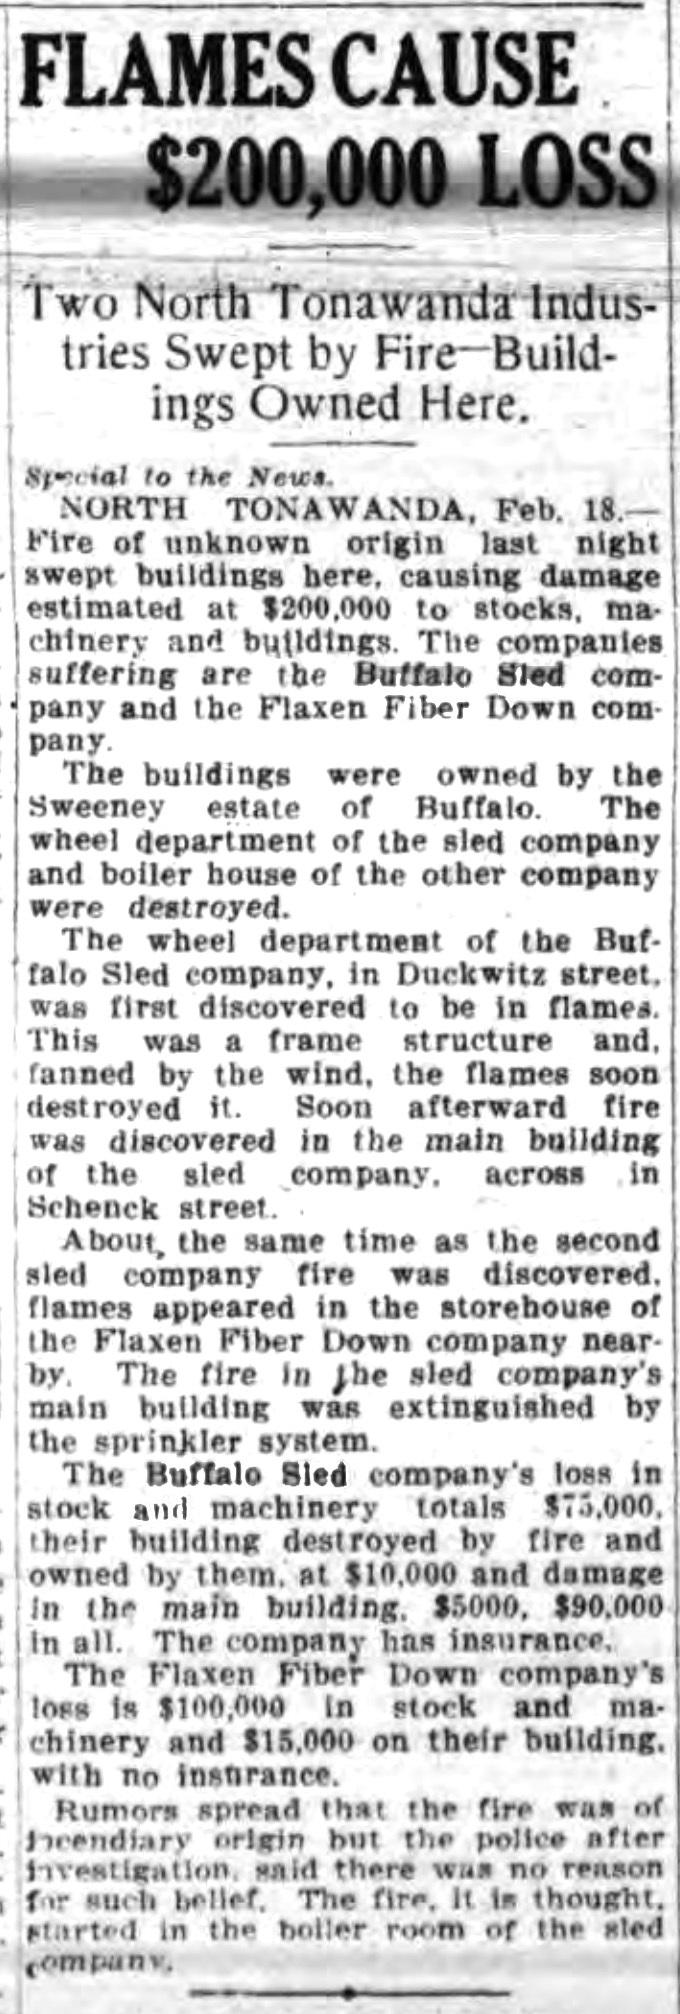 Flames cause 200,000 loss, article (Buffalo News, 1920-02-18).jpg